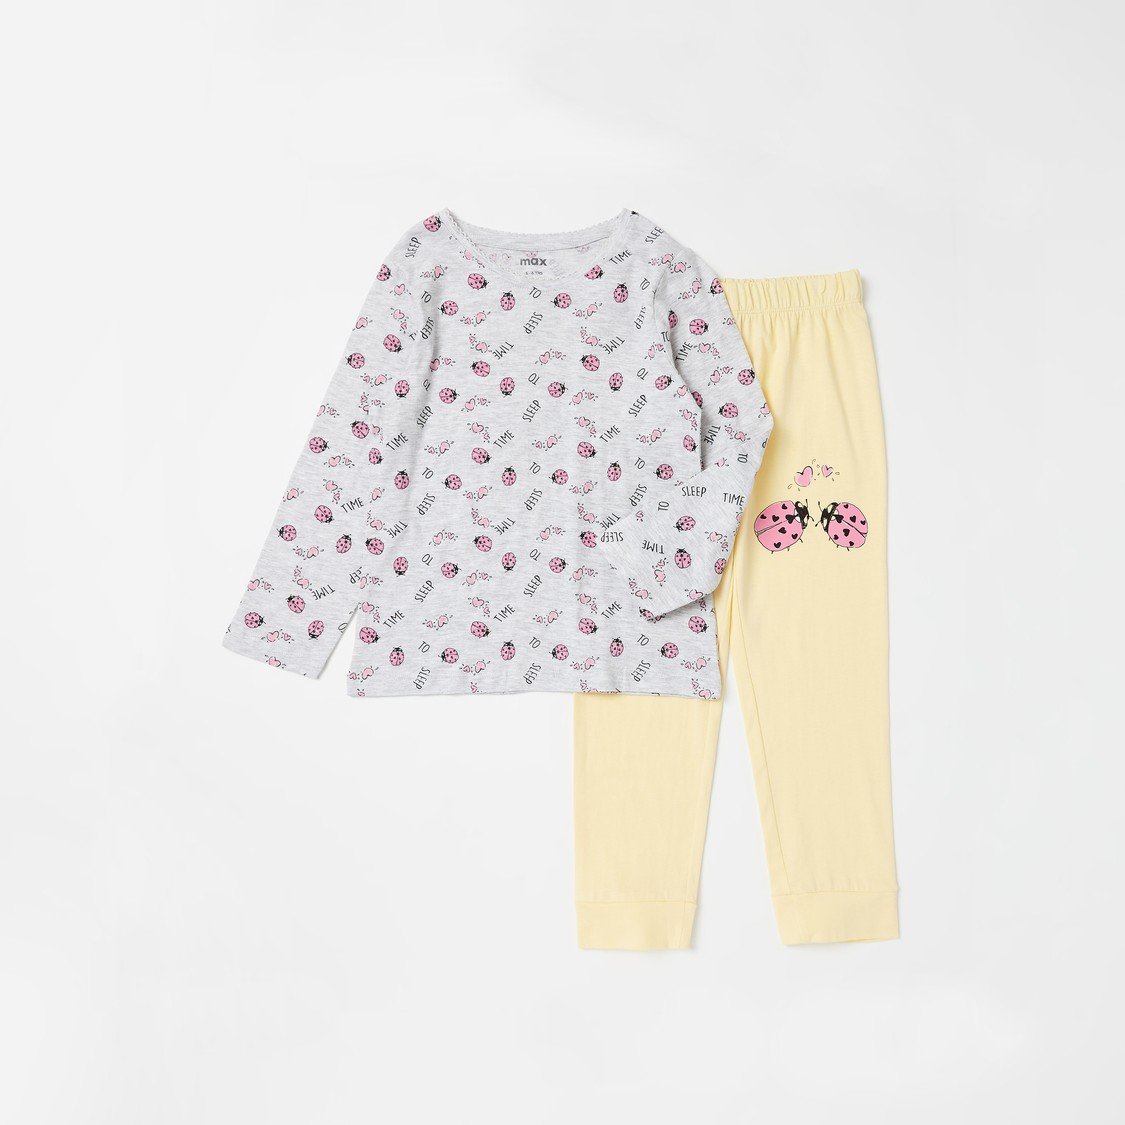 Set of 2 - Graphic Print T-shirt and Full Length Pyjamas